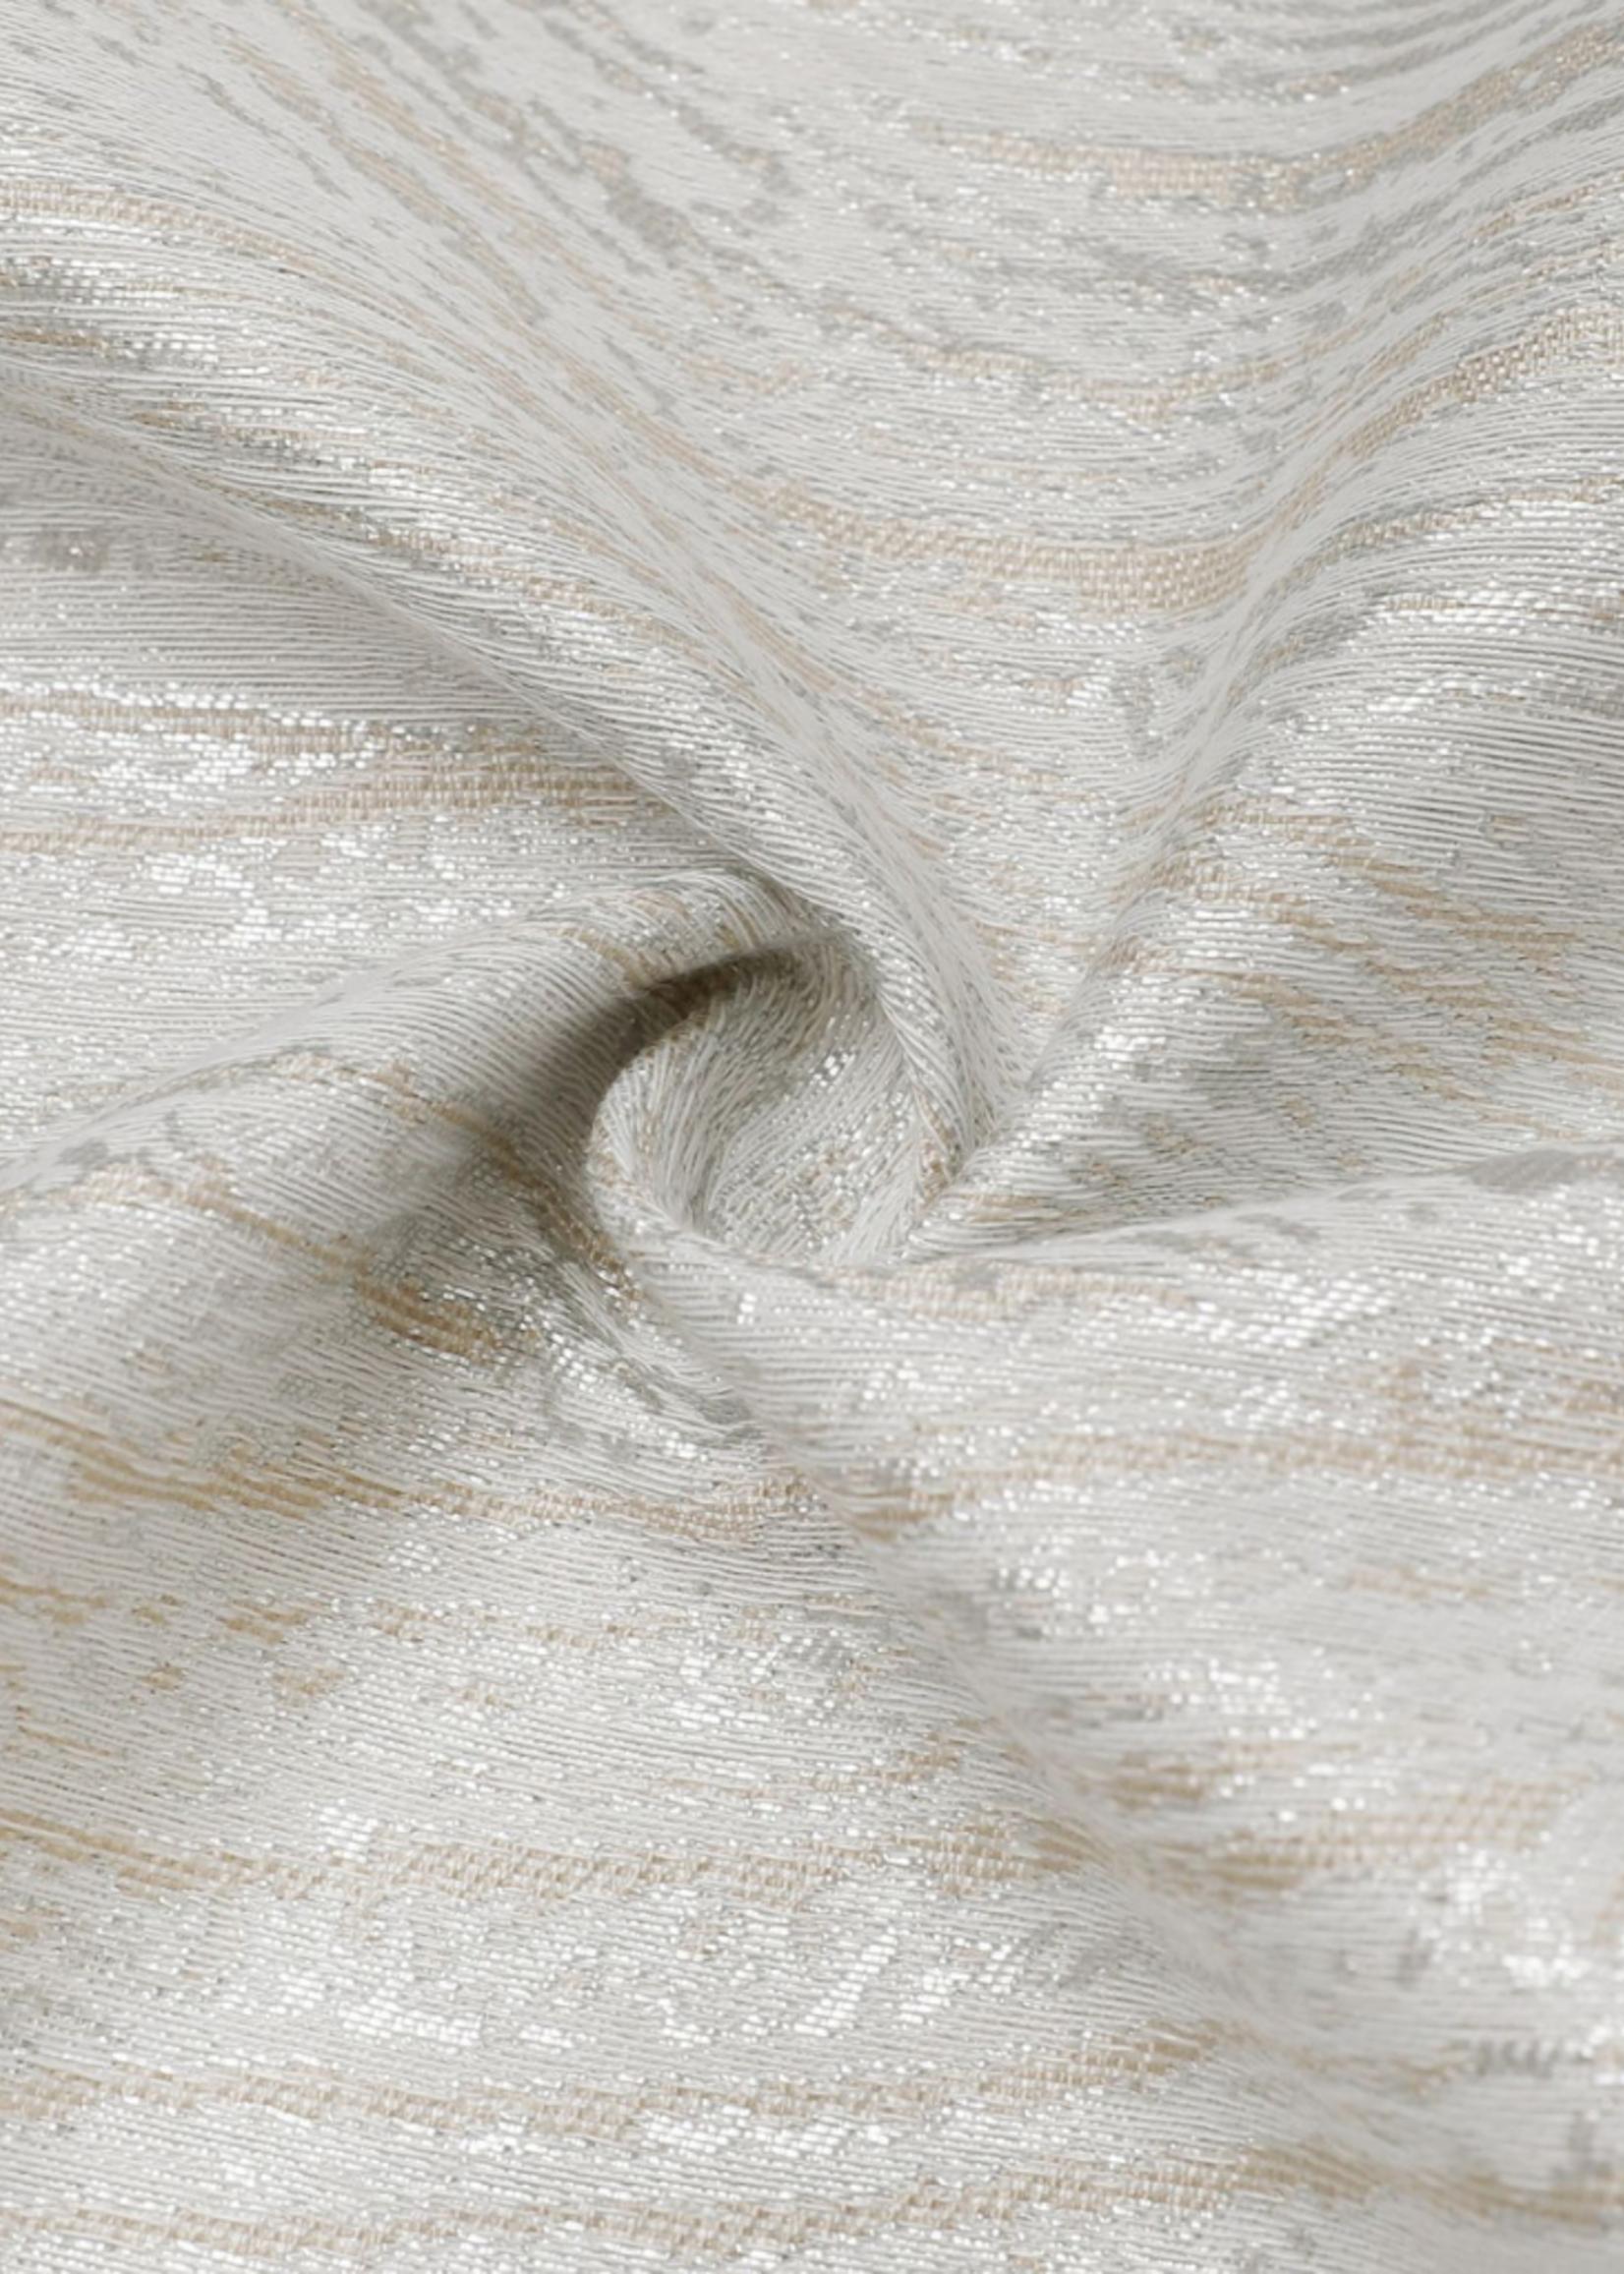 Jacquard Tablecloth Ivory/Gold #1212